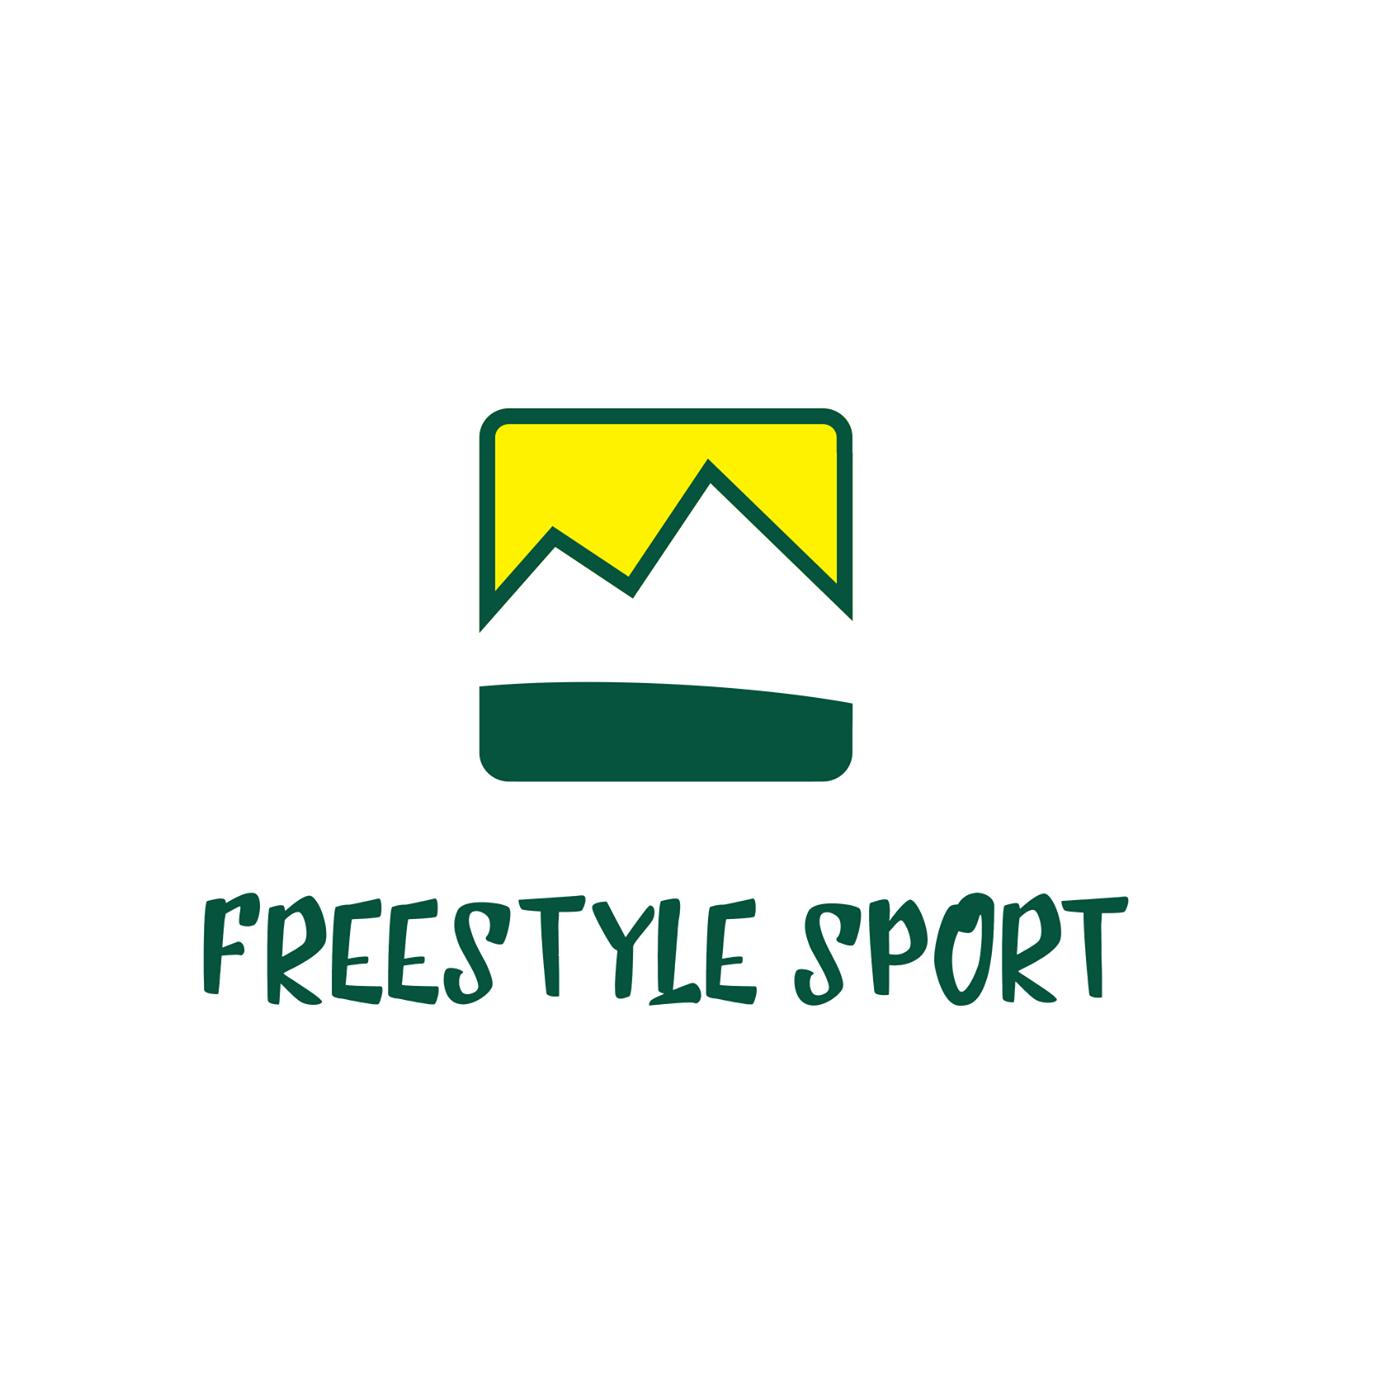 freestylesport.ro